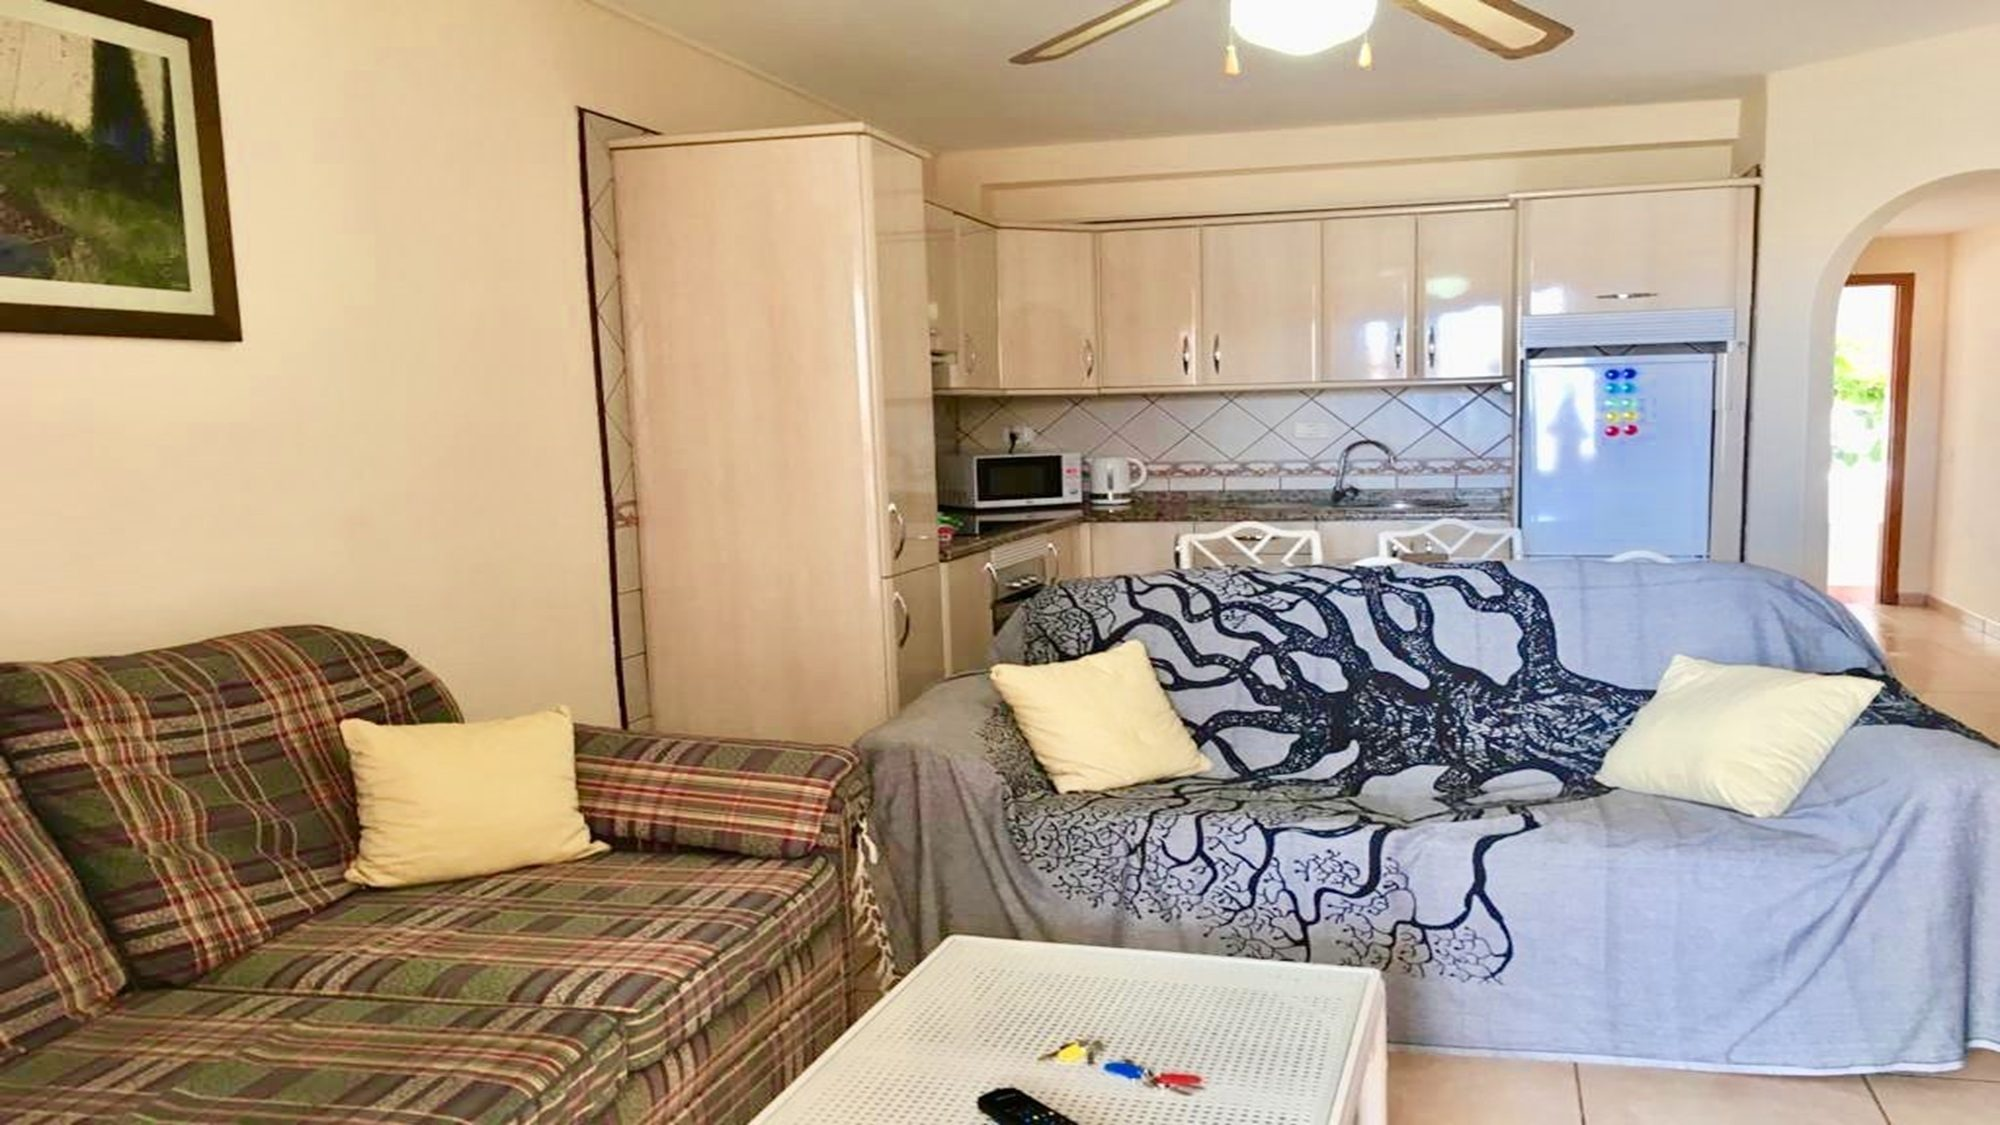 2 bedroom apartment tenerife to rent  los diamantes tenerife